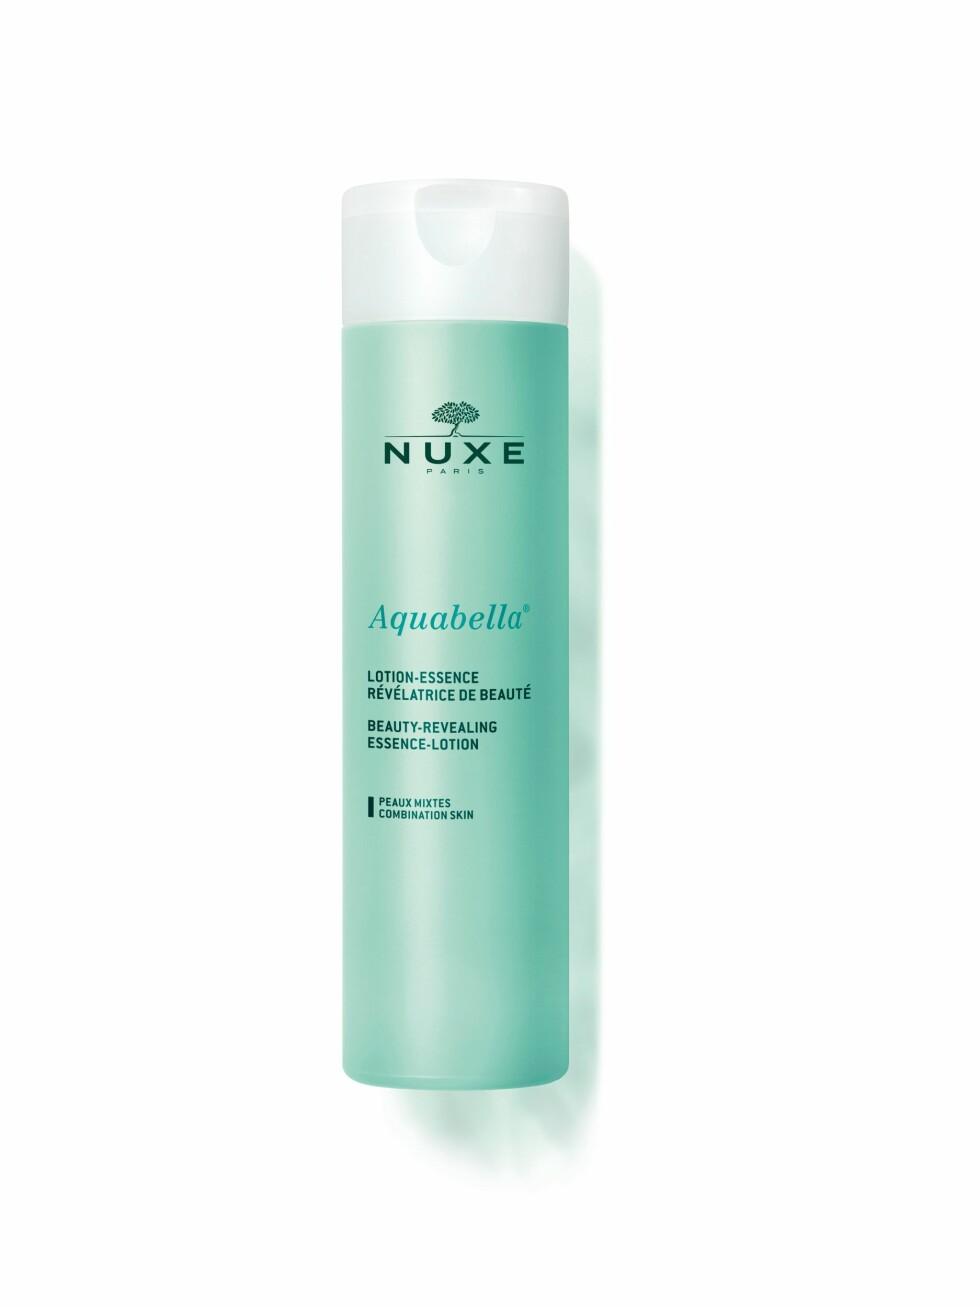 Essence-lotion ansiktsvann  | Aquabella | https://www.apotek1.no/produkter/nuxe-aquabella-essence-lotion-895231p?utm_source=KK.no&utm_medium=Advetorial&utm_campaign=Nuxe%20Aquabella